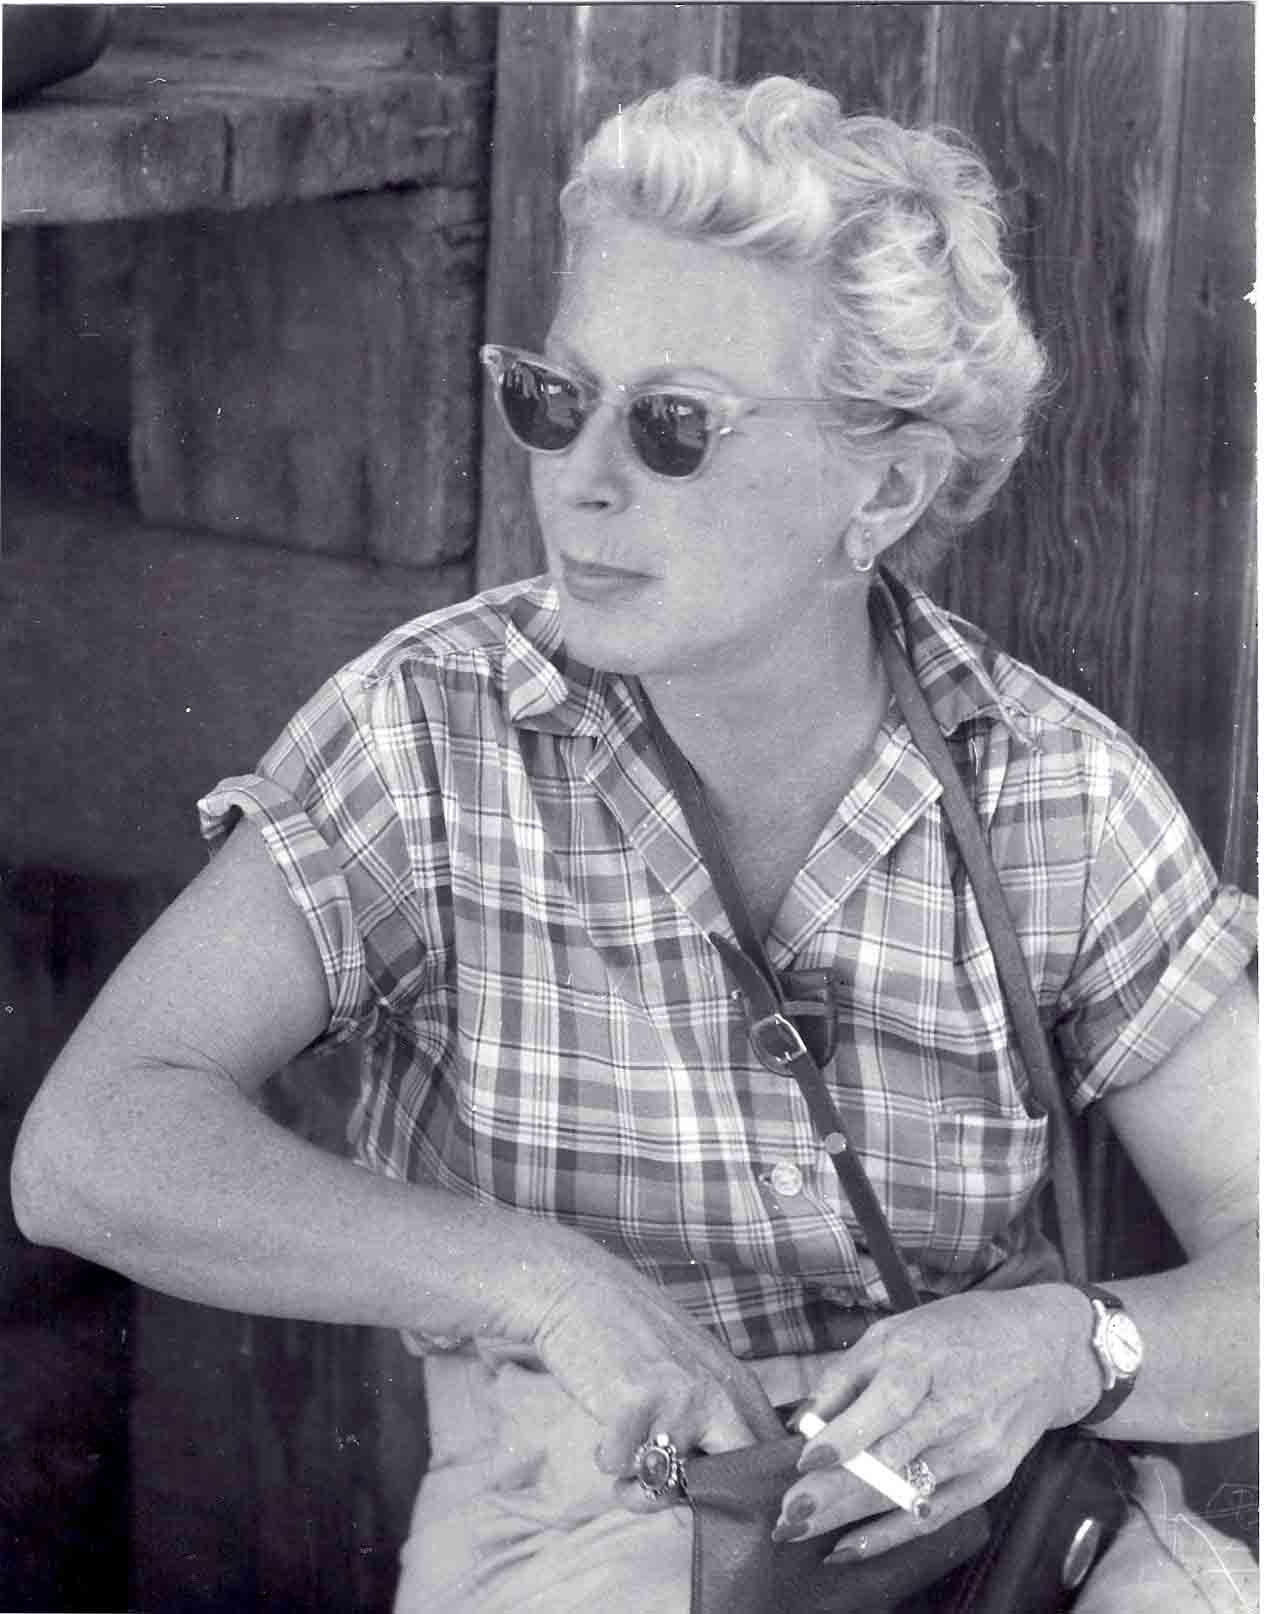 Mary Welsh, Mai 1956; Photo by Modeste von Unruh